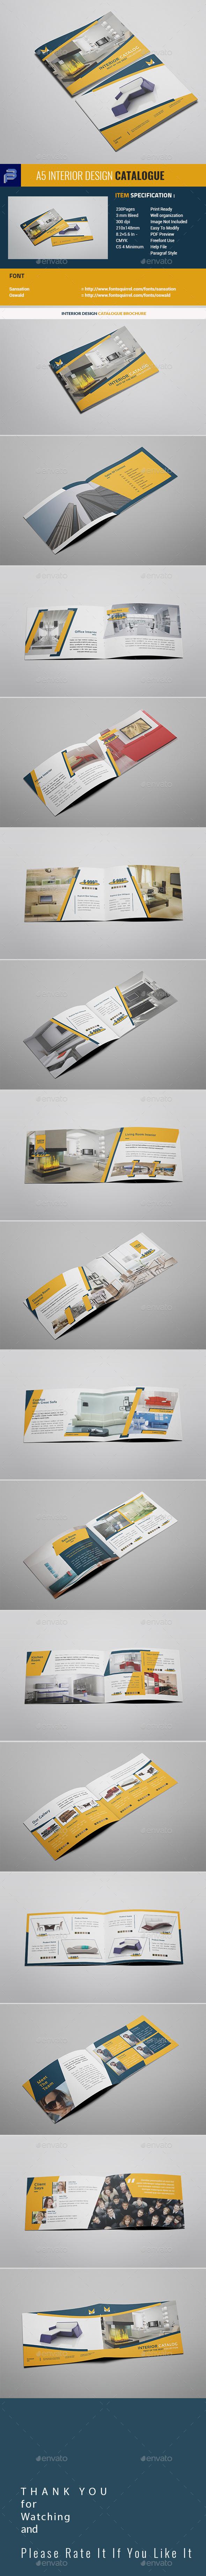 A5 Interior Design Catalogue Brochure - Catalogs Brochures